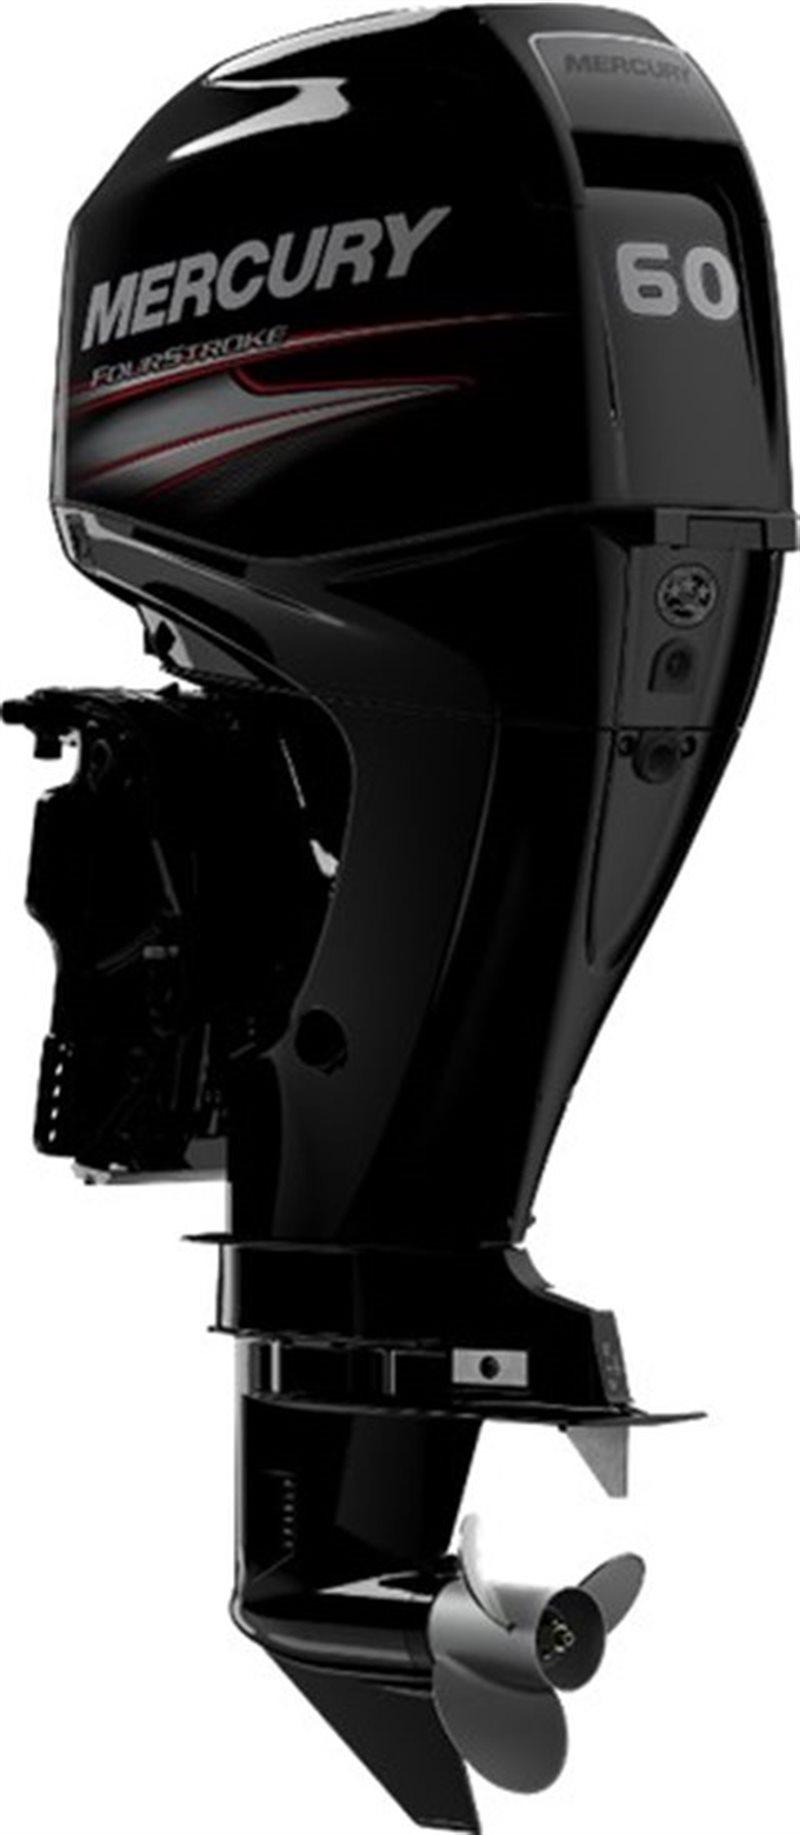 2021 Mercury Outboard FourStroke 40-60 hp 60 hp EFI at Pharo Marine, Waunakee, WI 53597